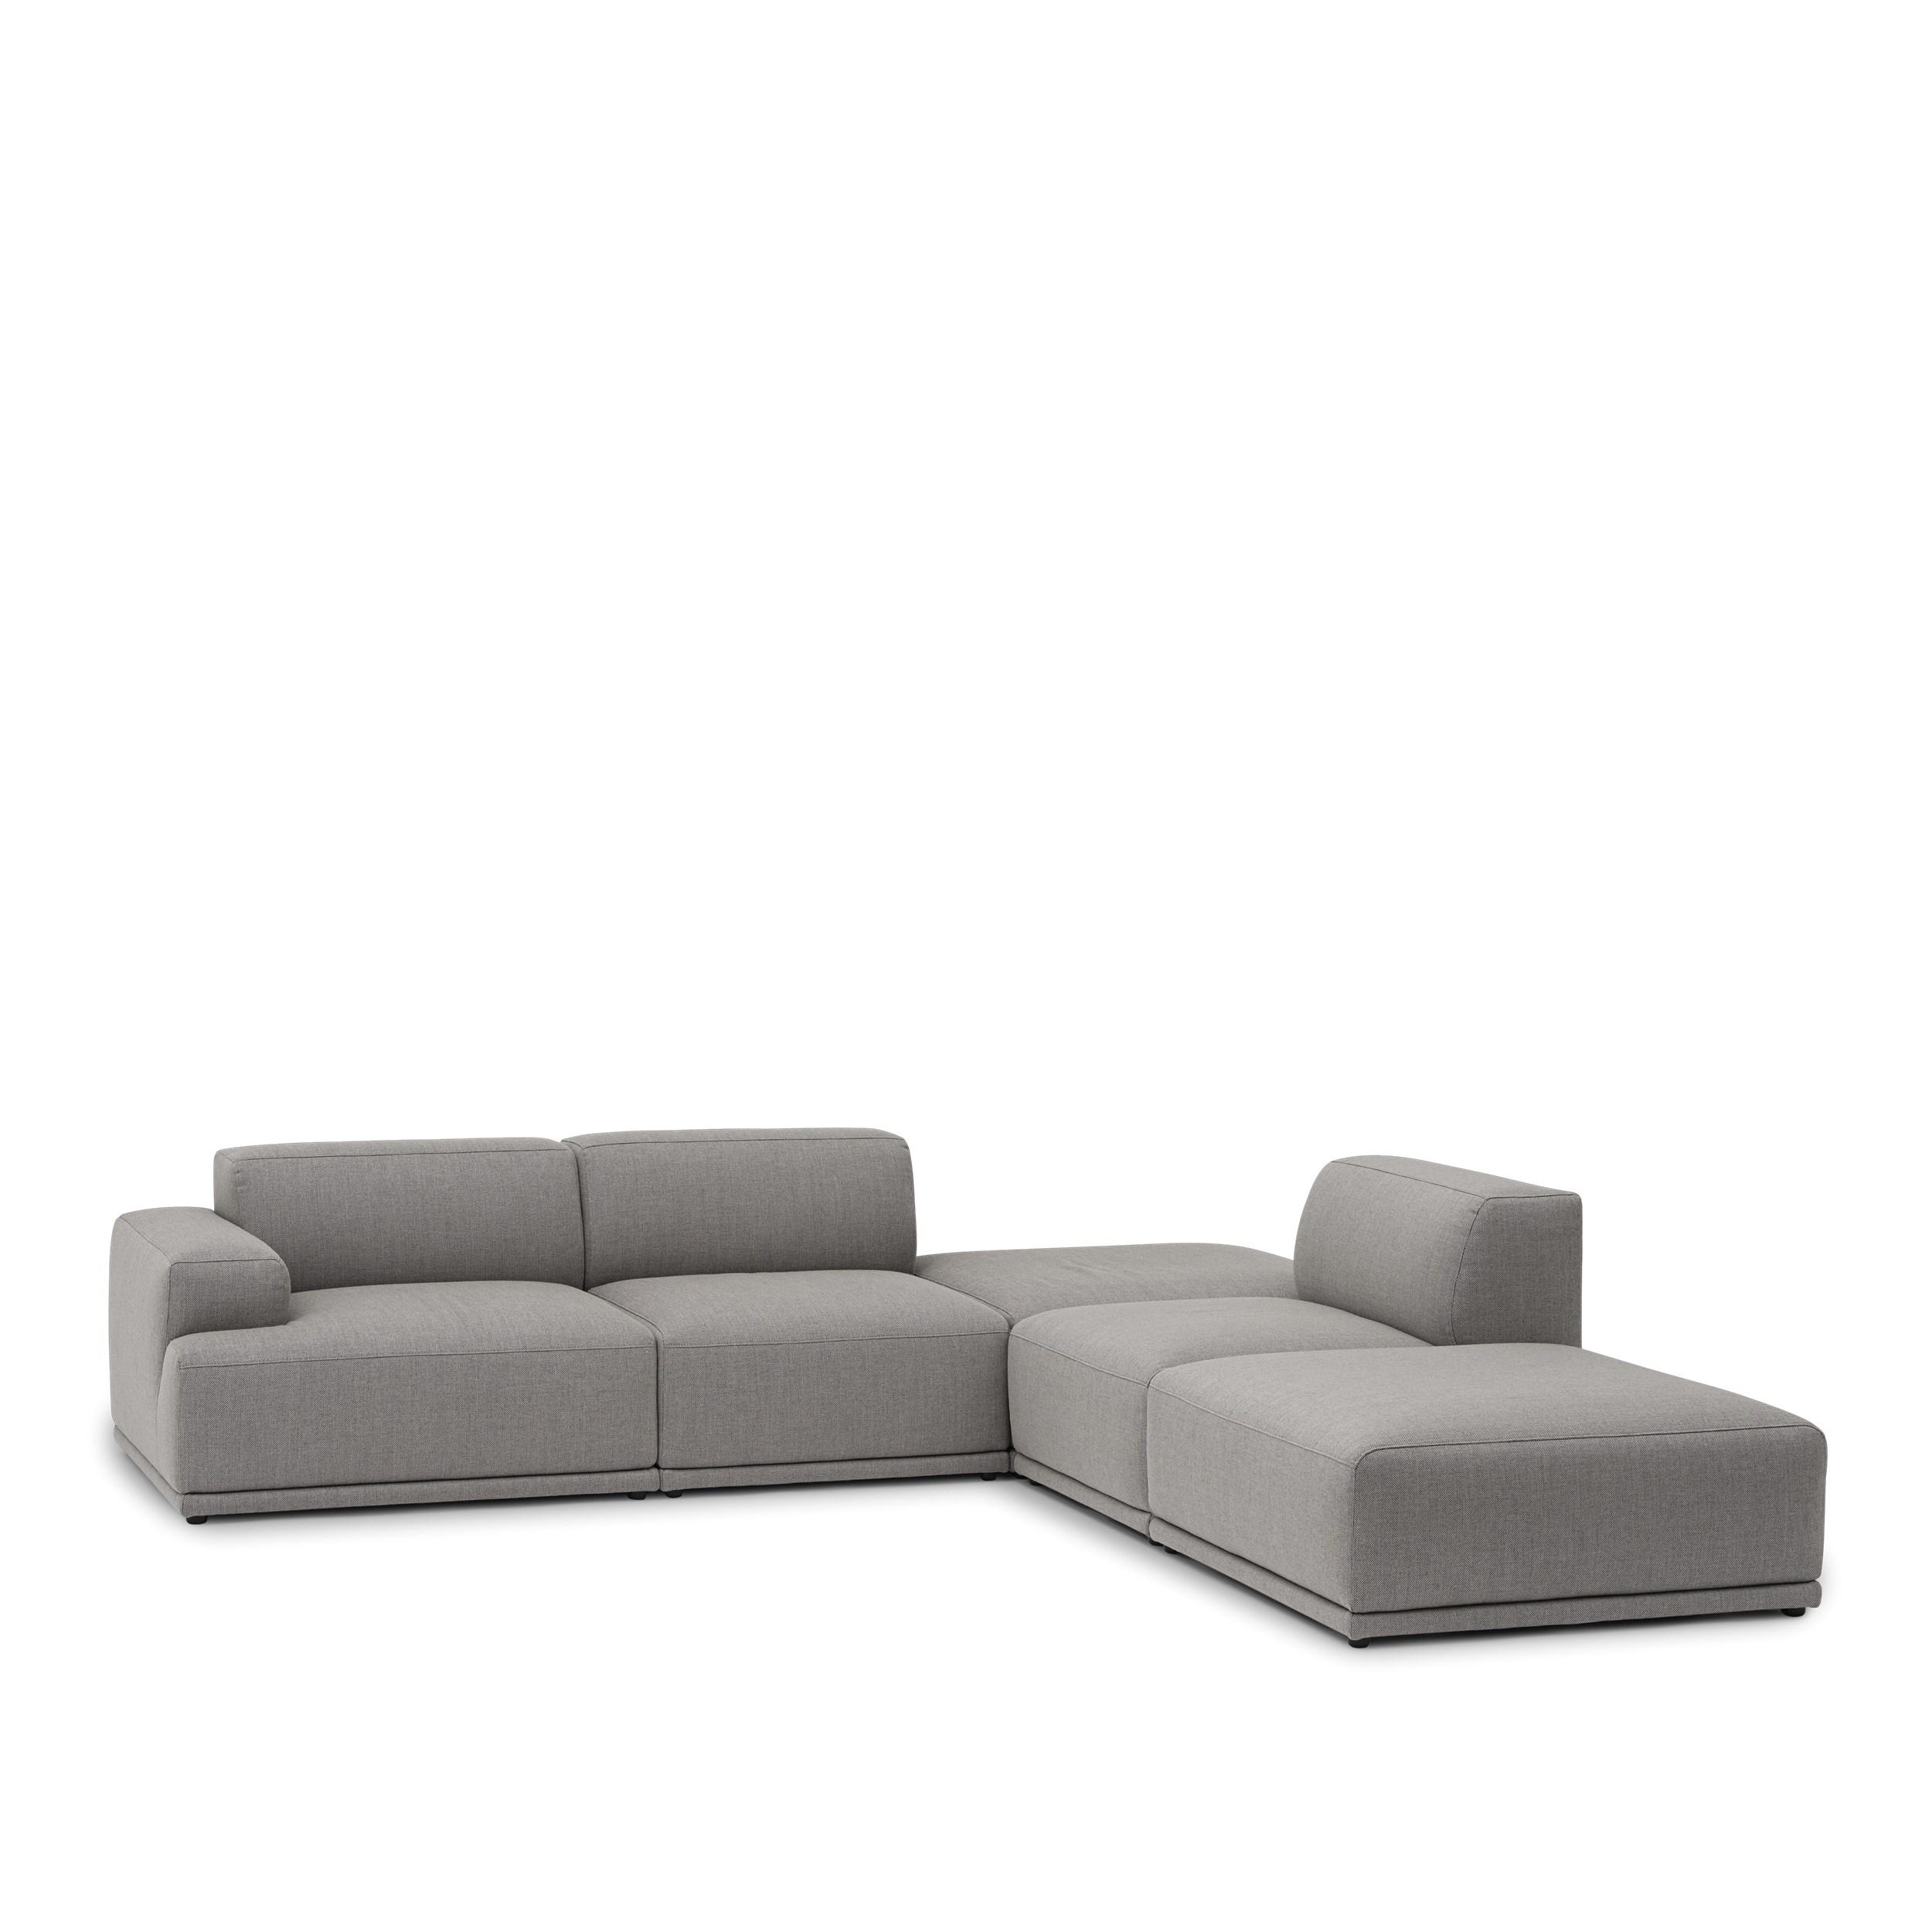 Connect Modular SOFT Sofa No 3